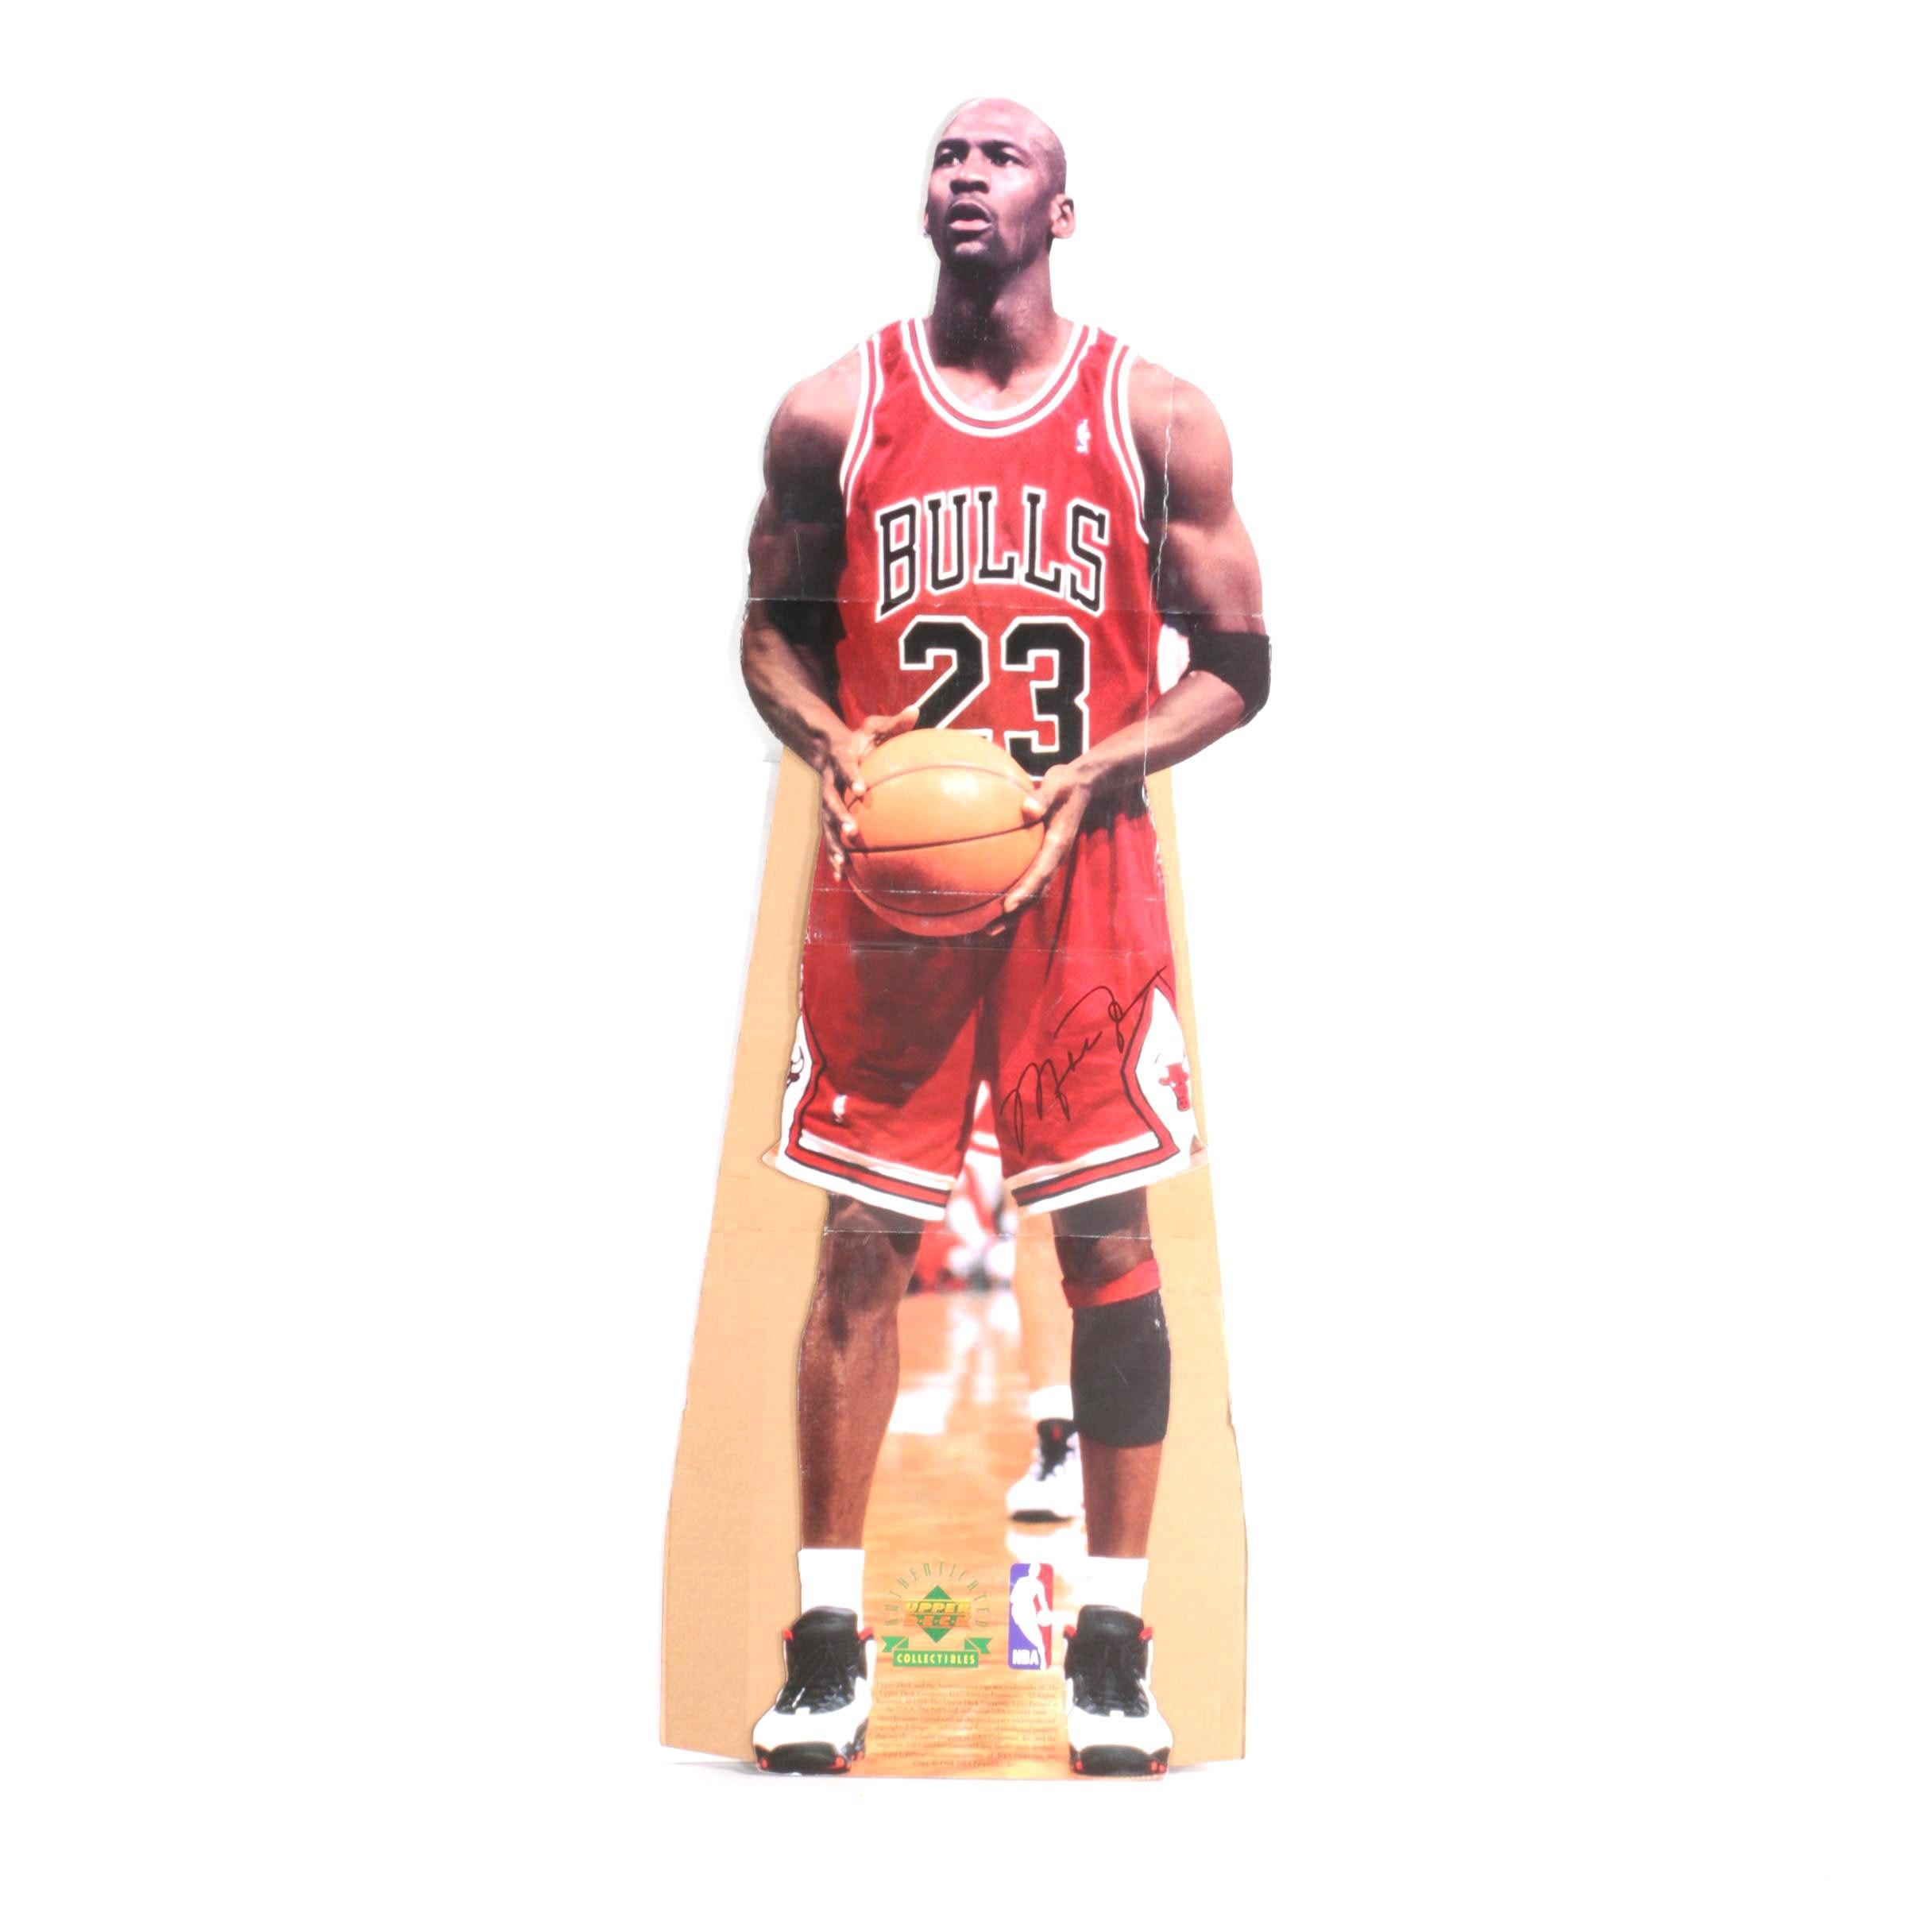 1998 Upper Deck Michael Jordan Cardboard Cut-Out